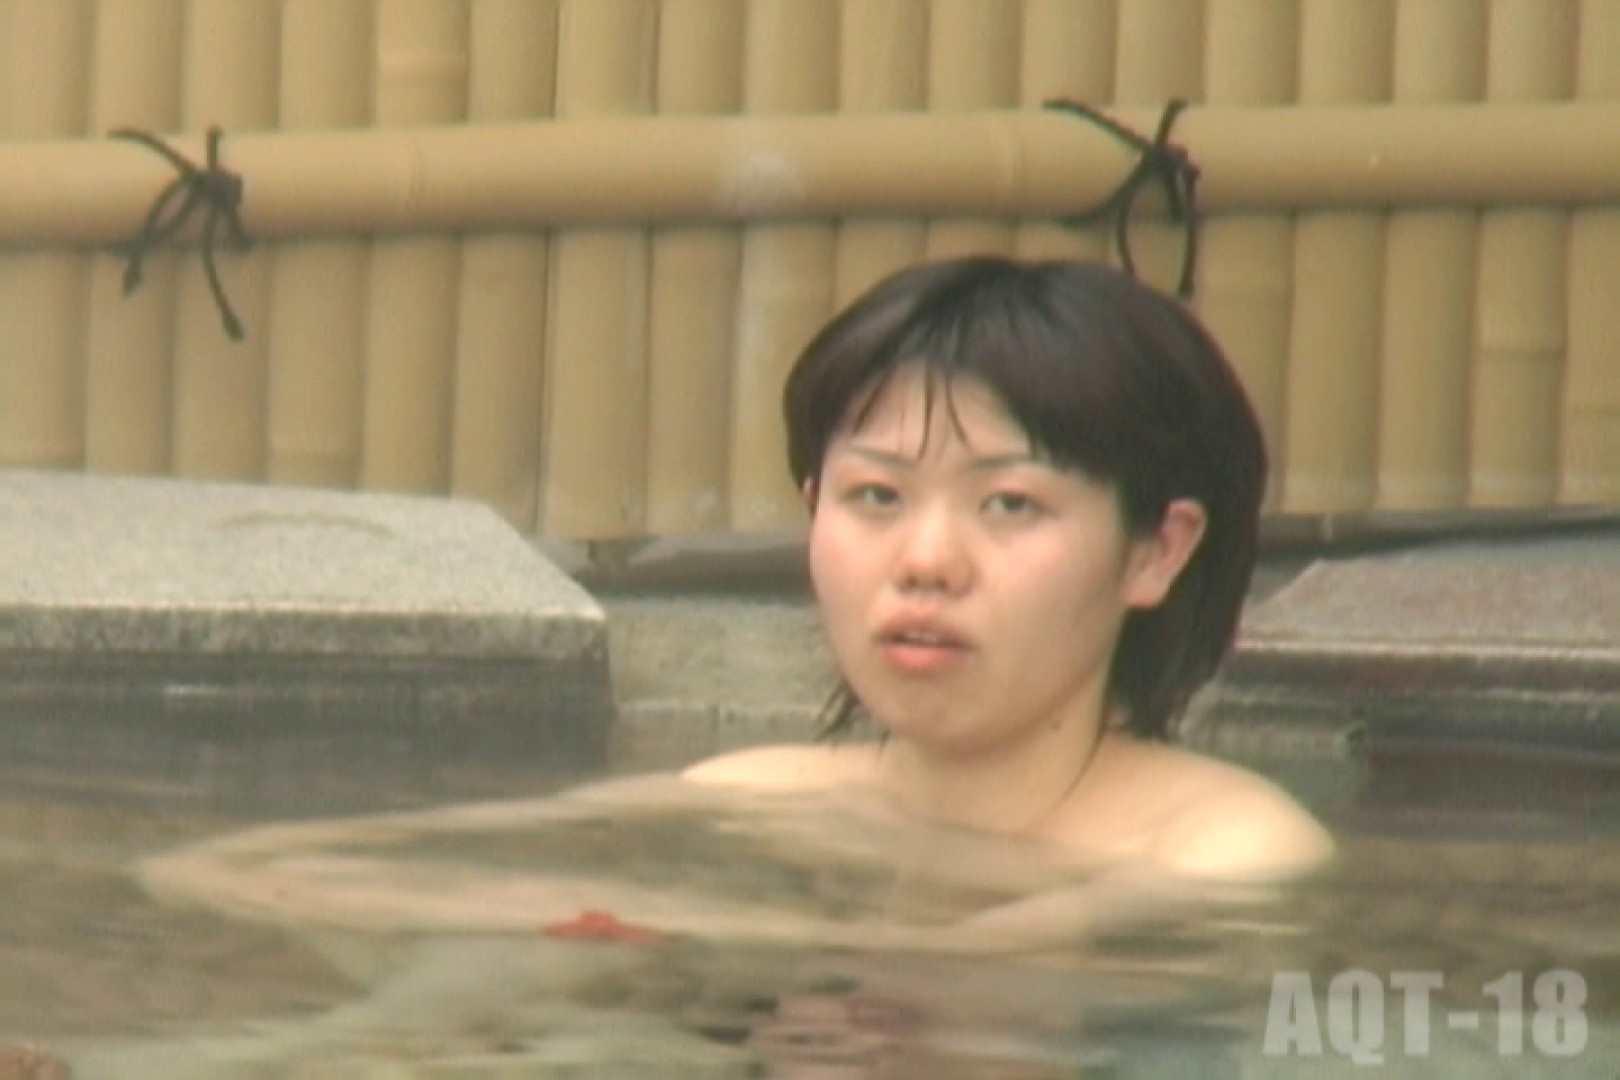 Aquaな露天風呂Vol.861 盗撮師作品  104pic 60